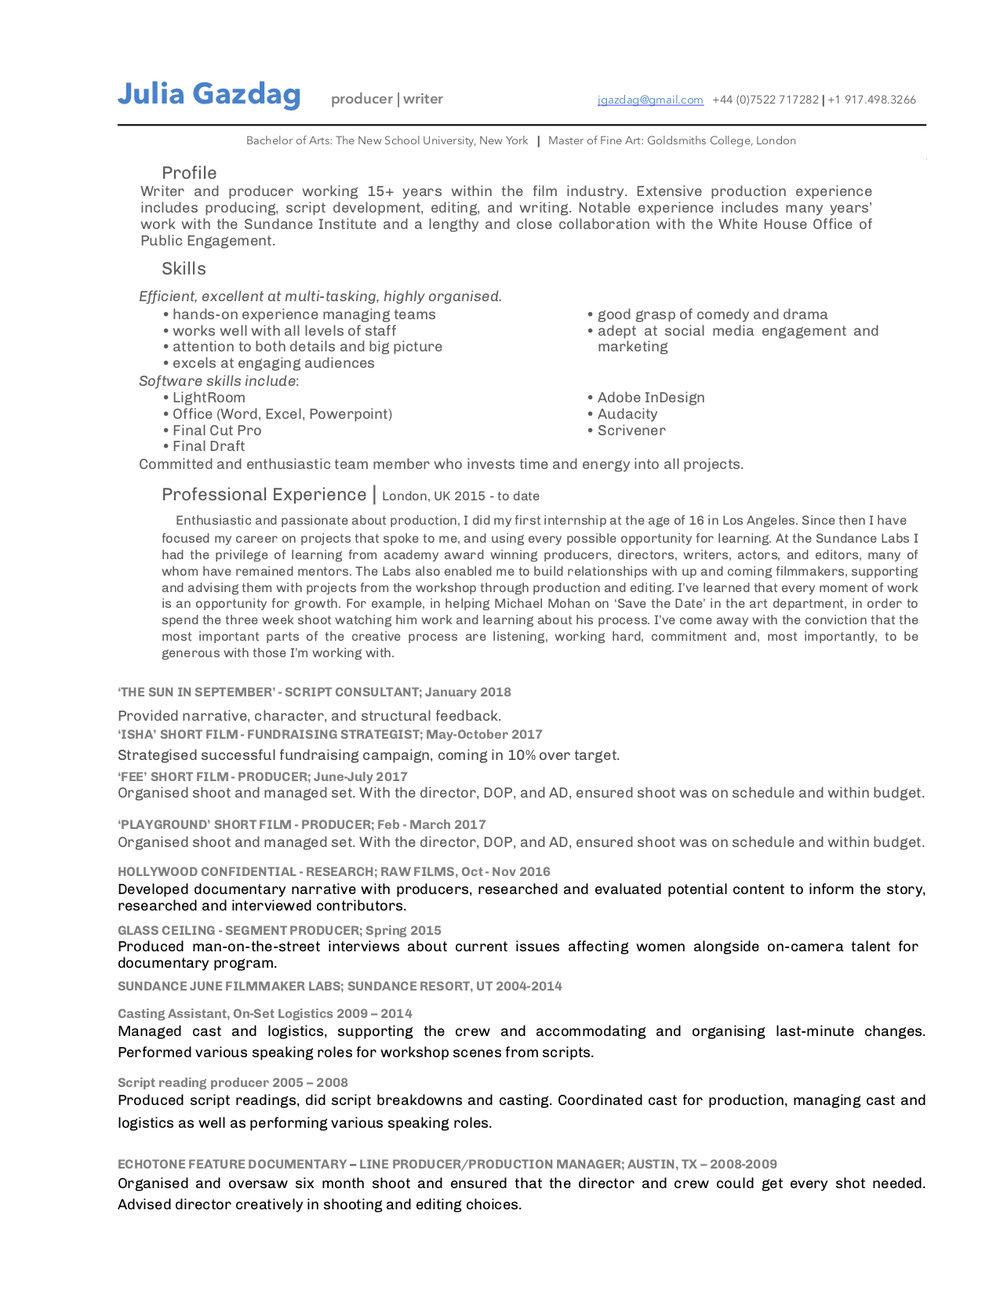 Julia Gazdag Expanded CV.jpg